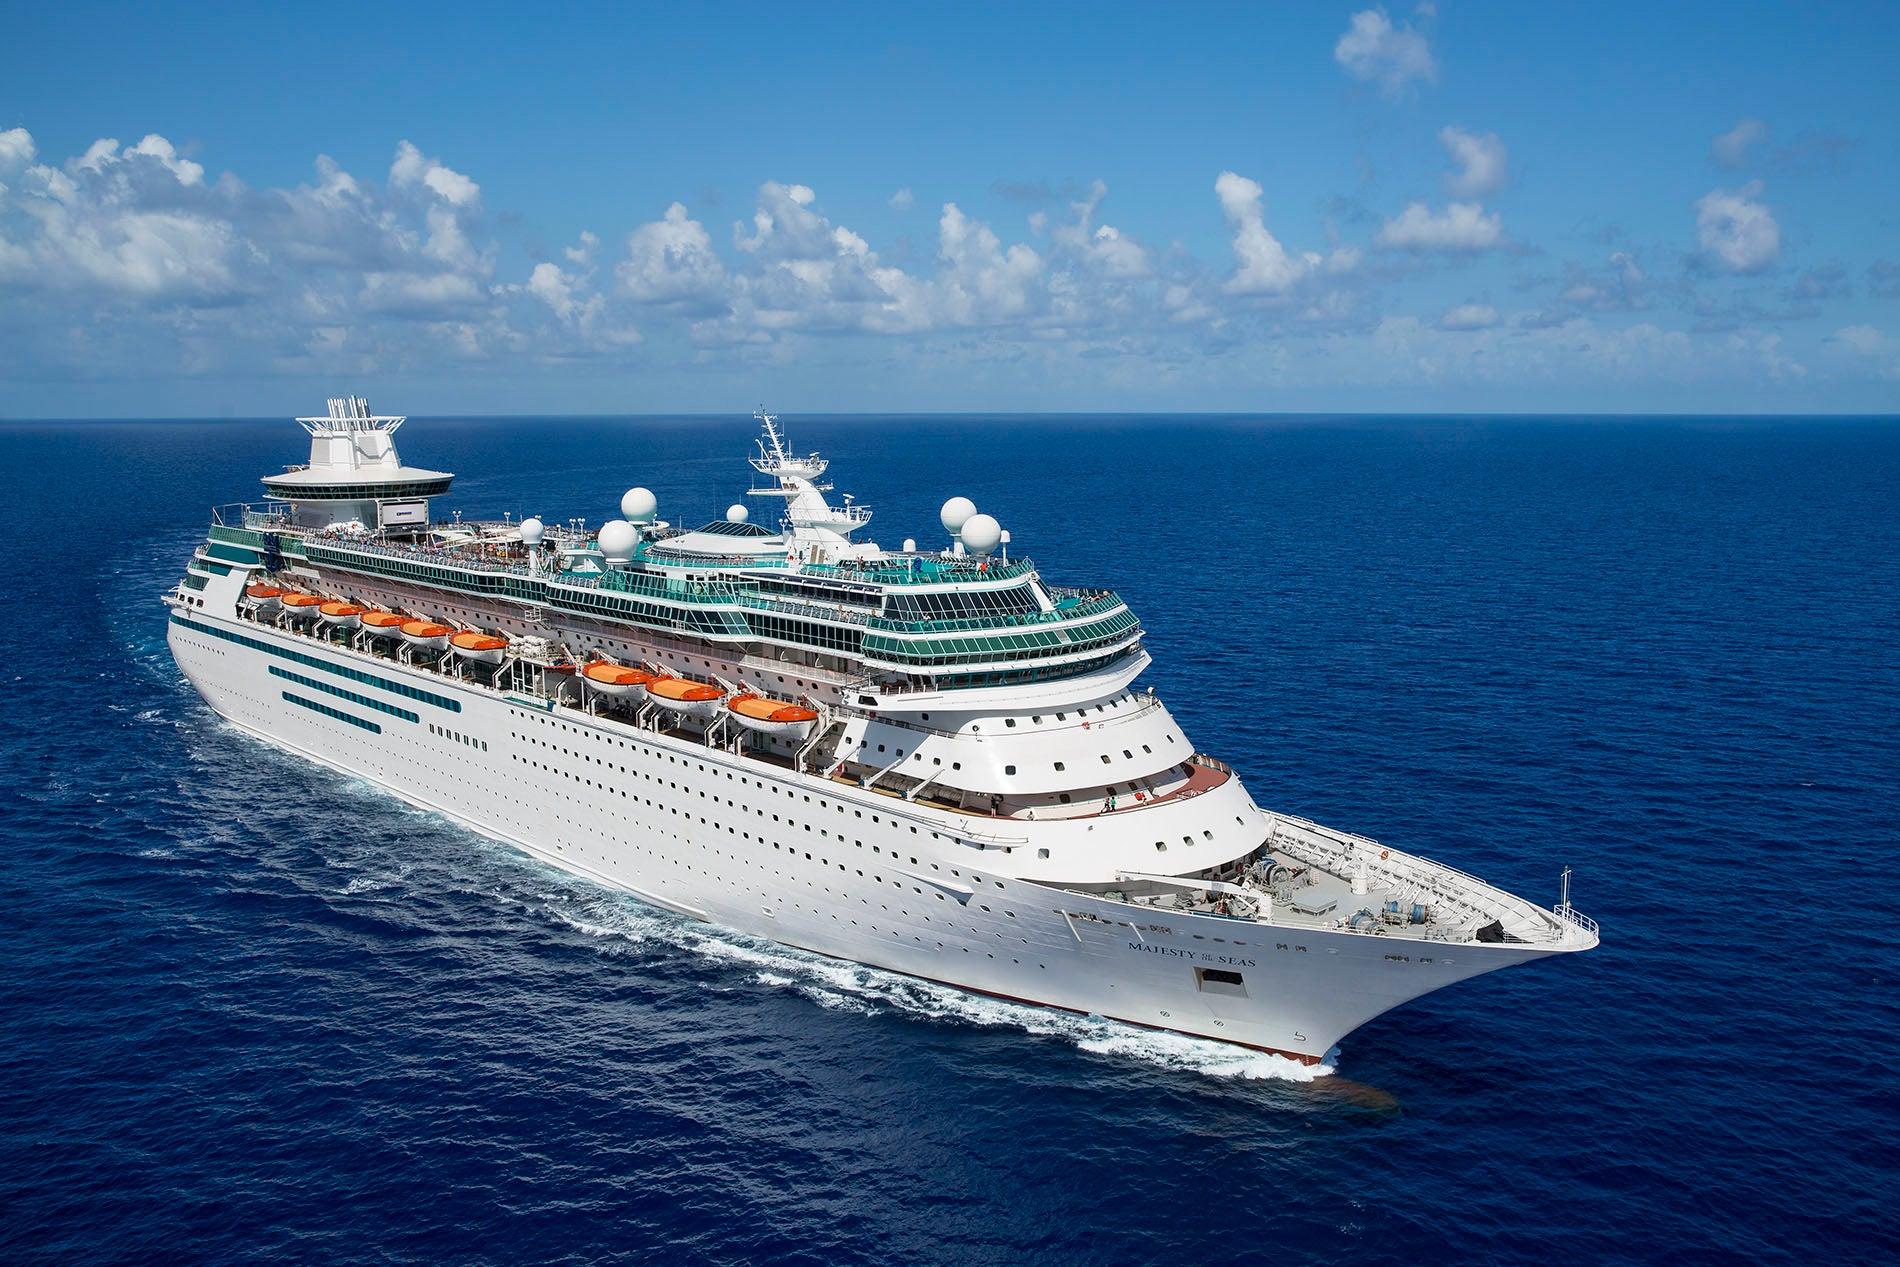 Royal Caribbean to slash fleet size with departure of older vessels